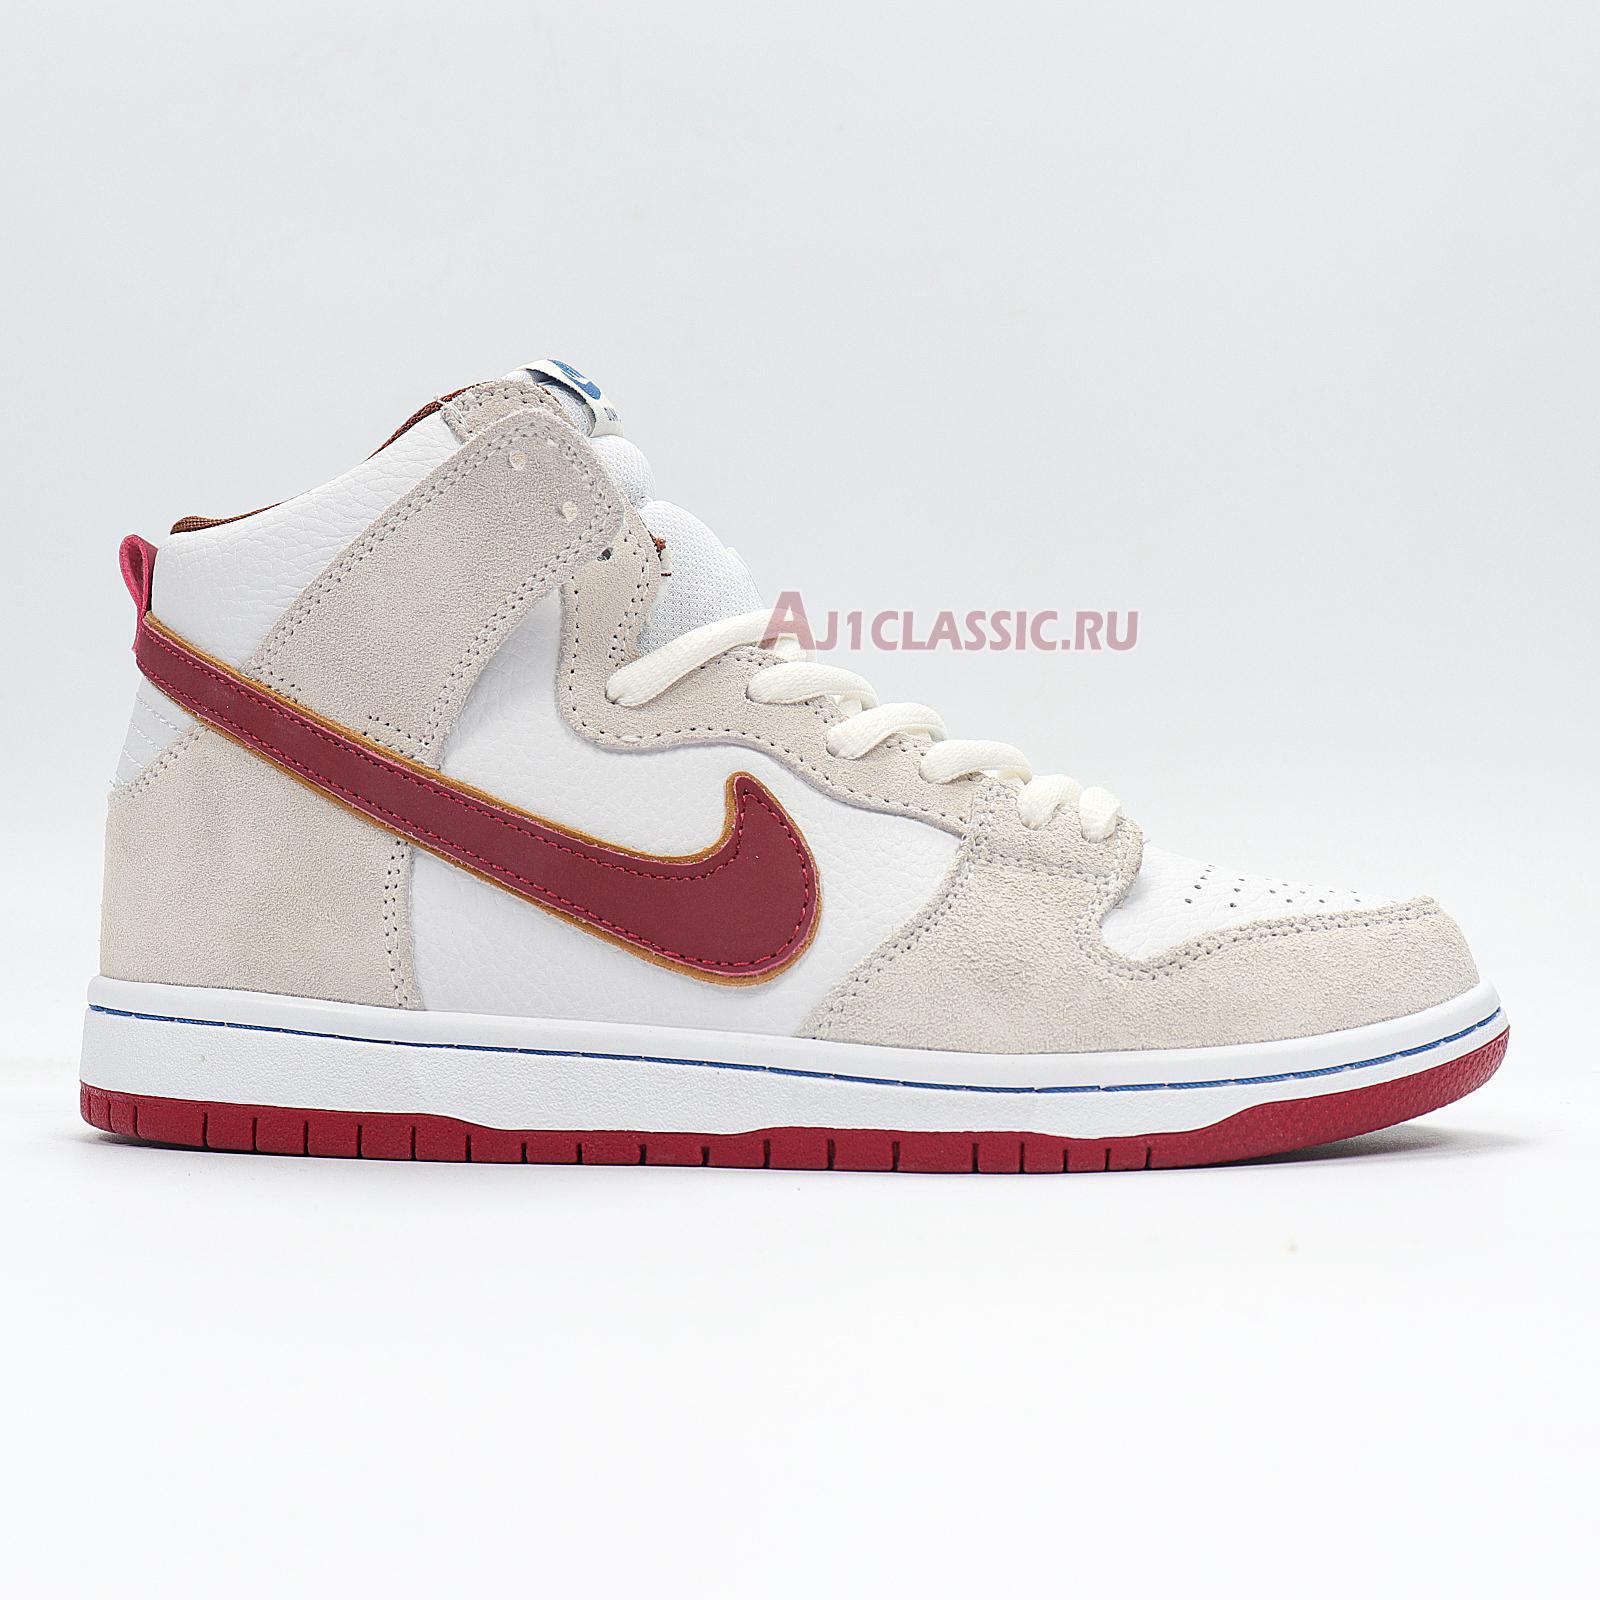 "Nike Dunk High SB ""Sail"" CV9499-100"